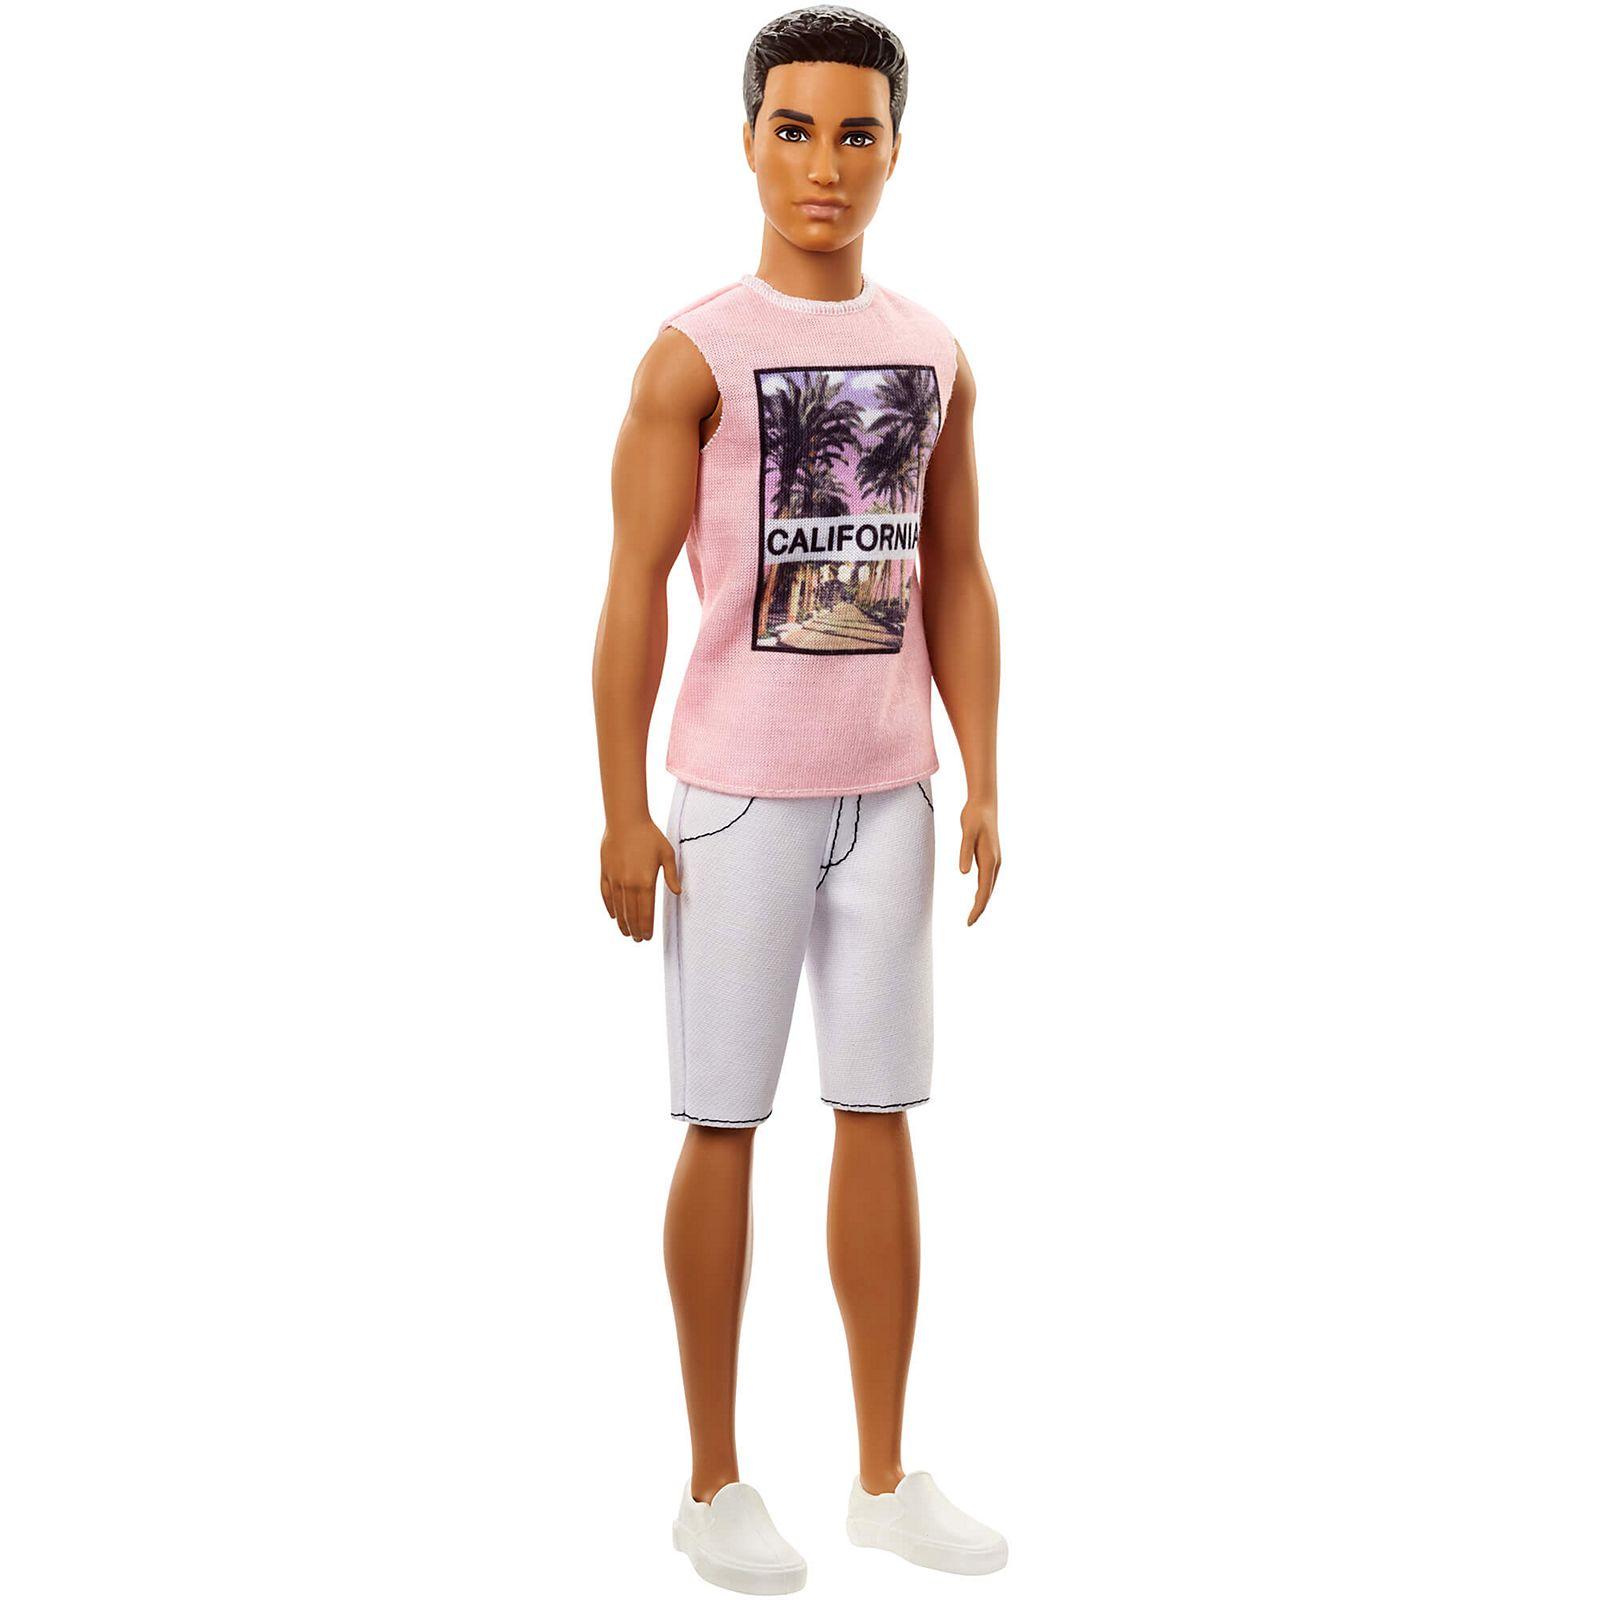 Ken Fashionistas Doll 4 Cali Cool | Barbie Wiki | Fandom